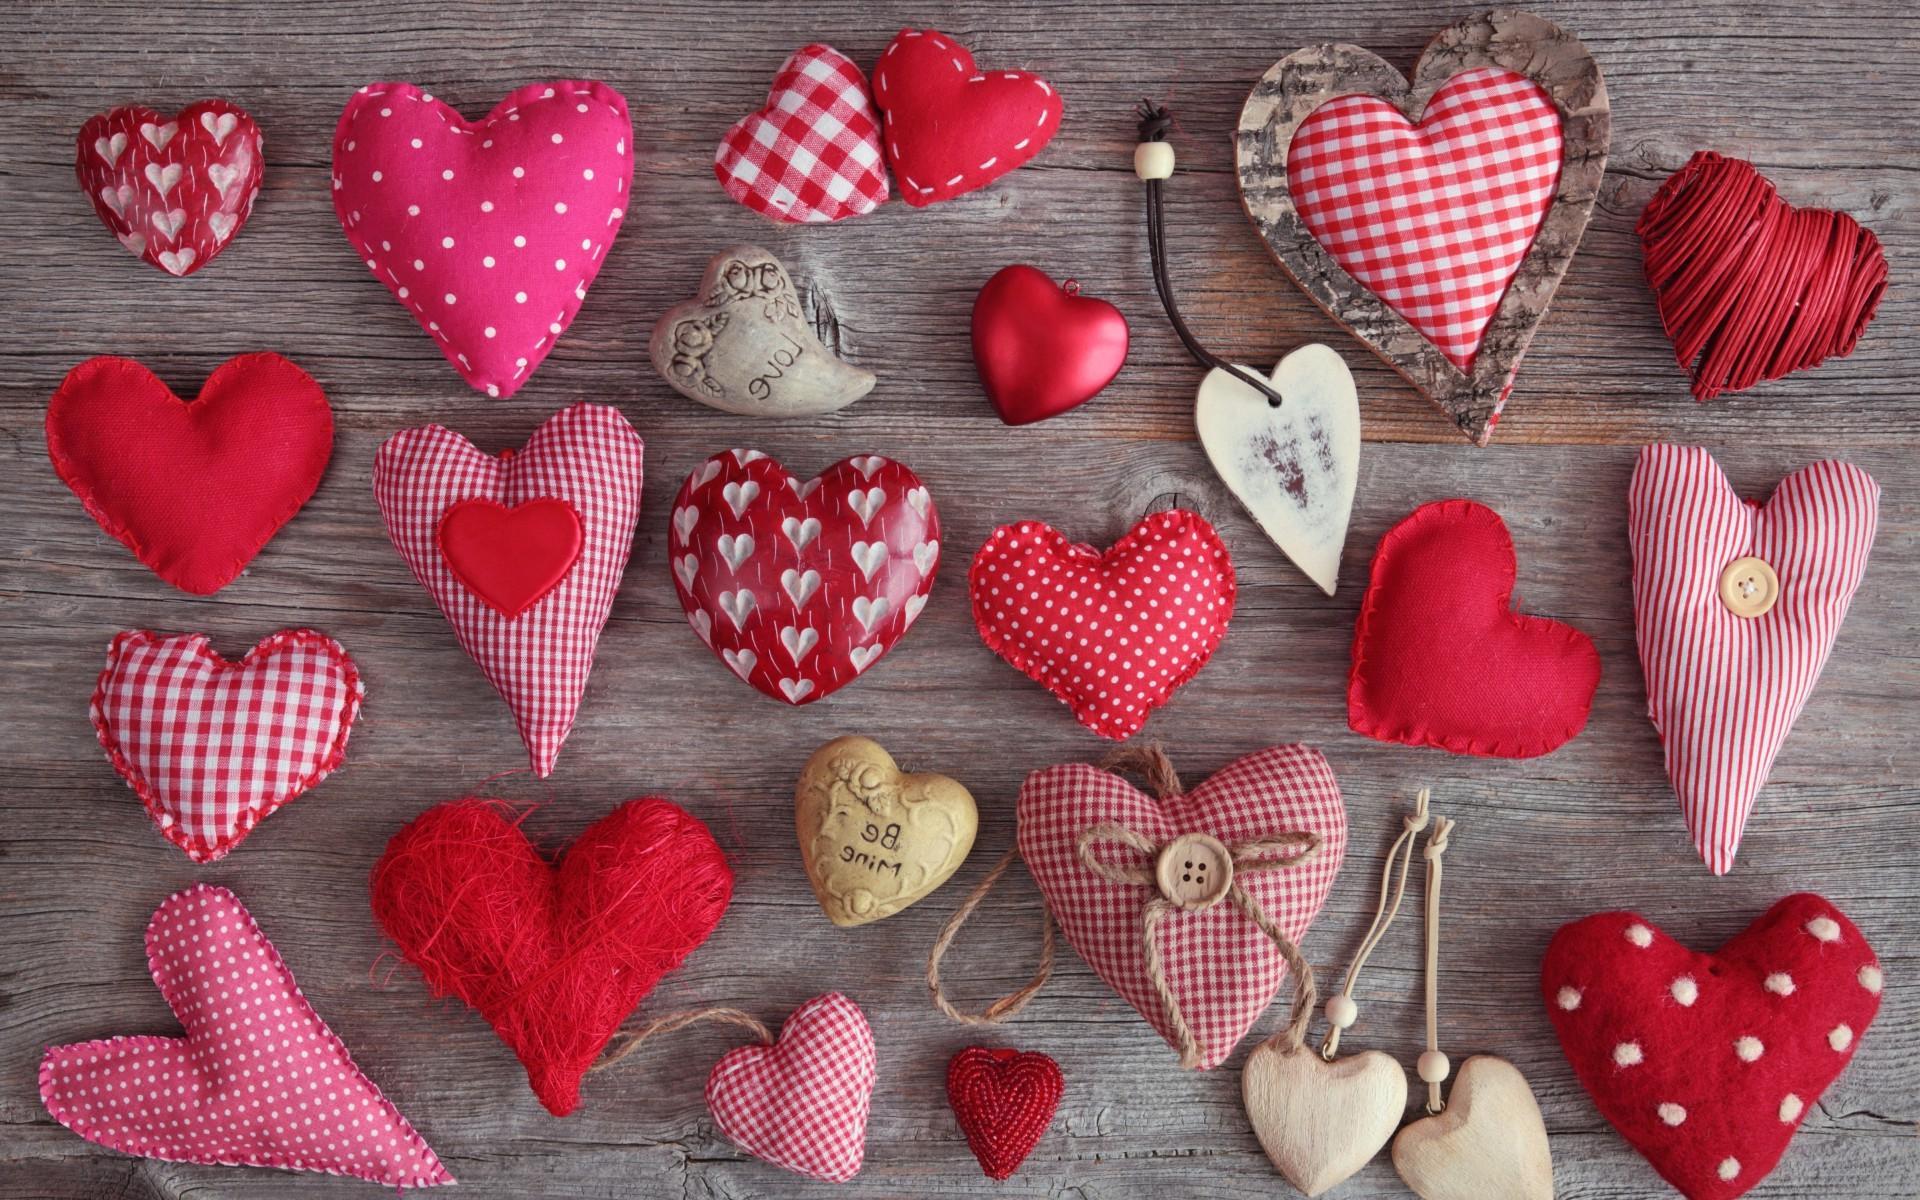 Valentines Day Computer Background 719028   HD Wallpaper Download 1920x1200